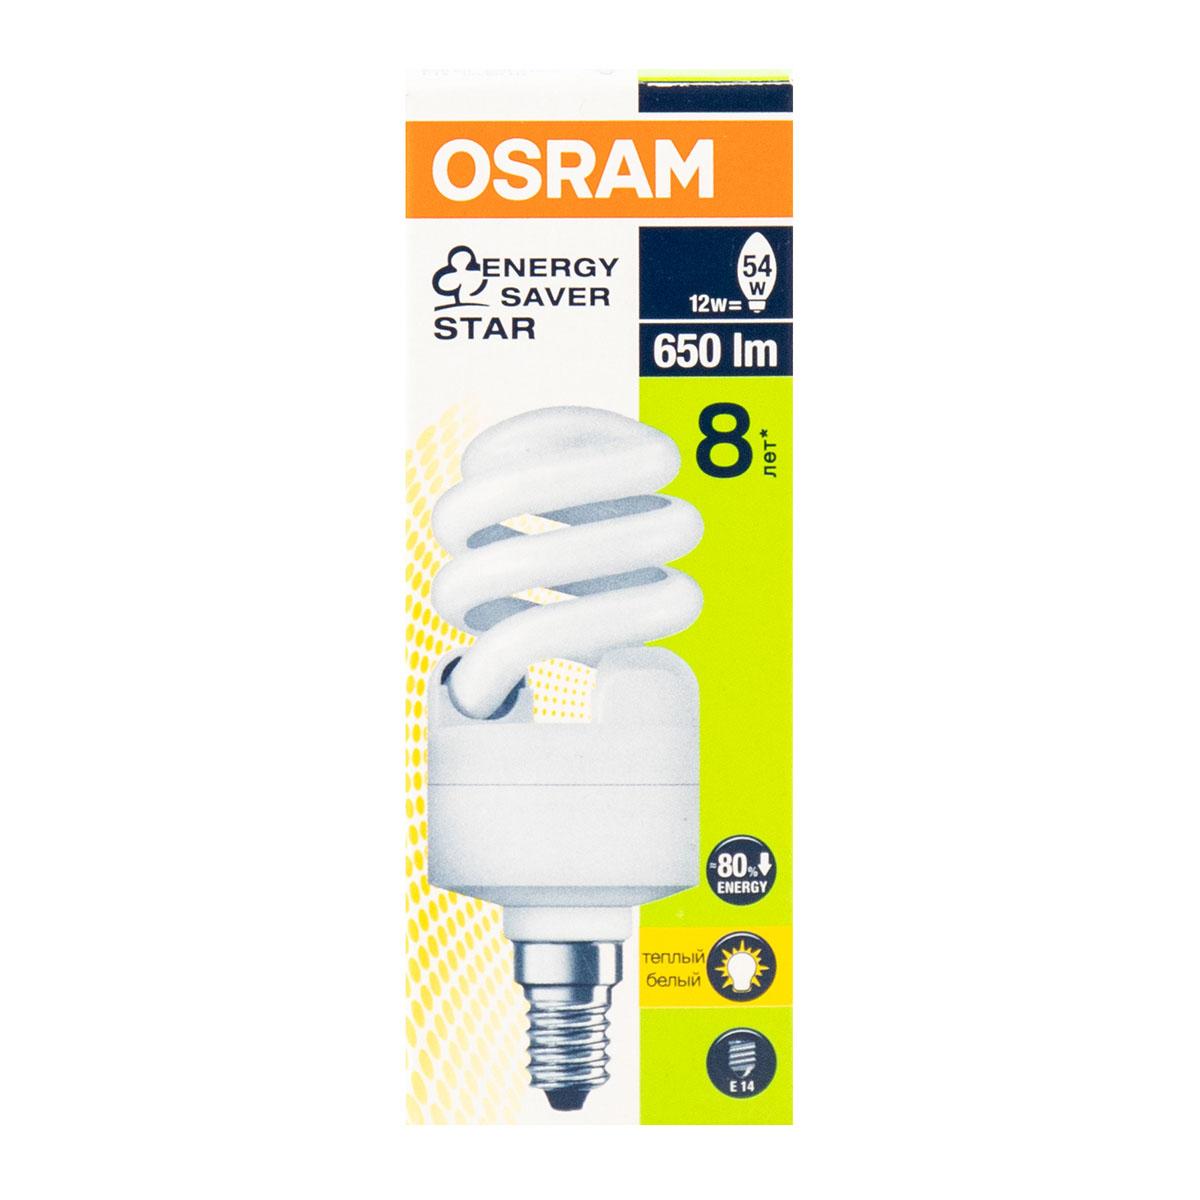 Osram энергосбер., 12W, E14